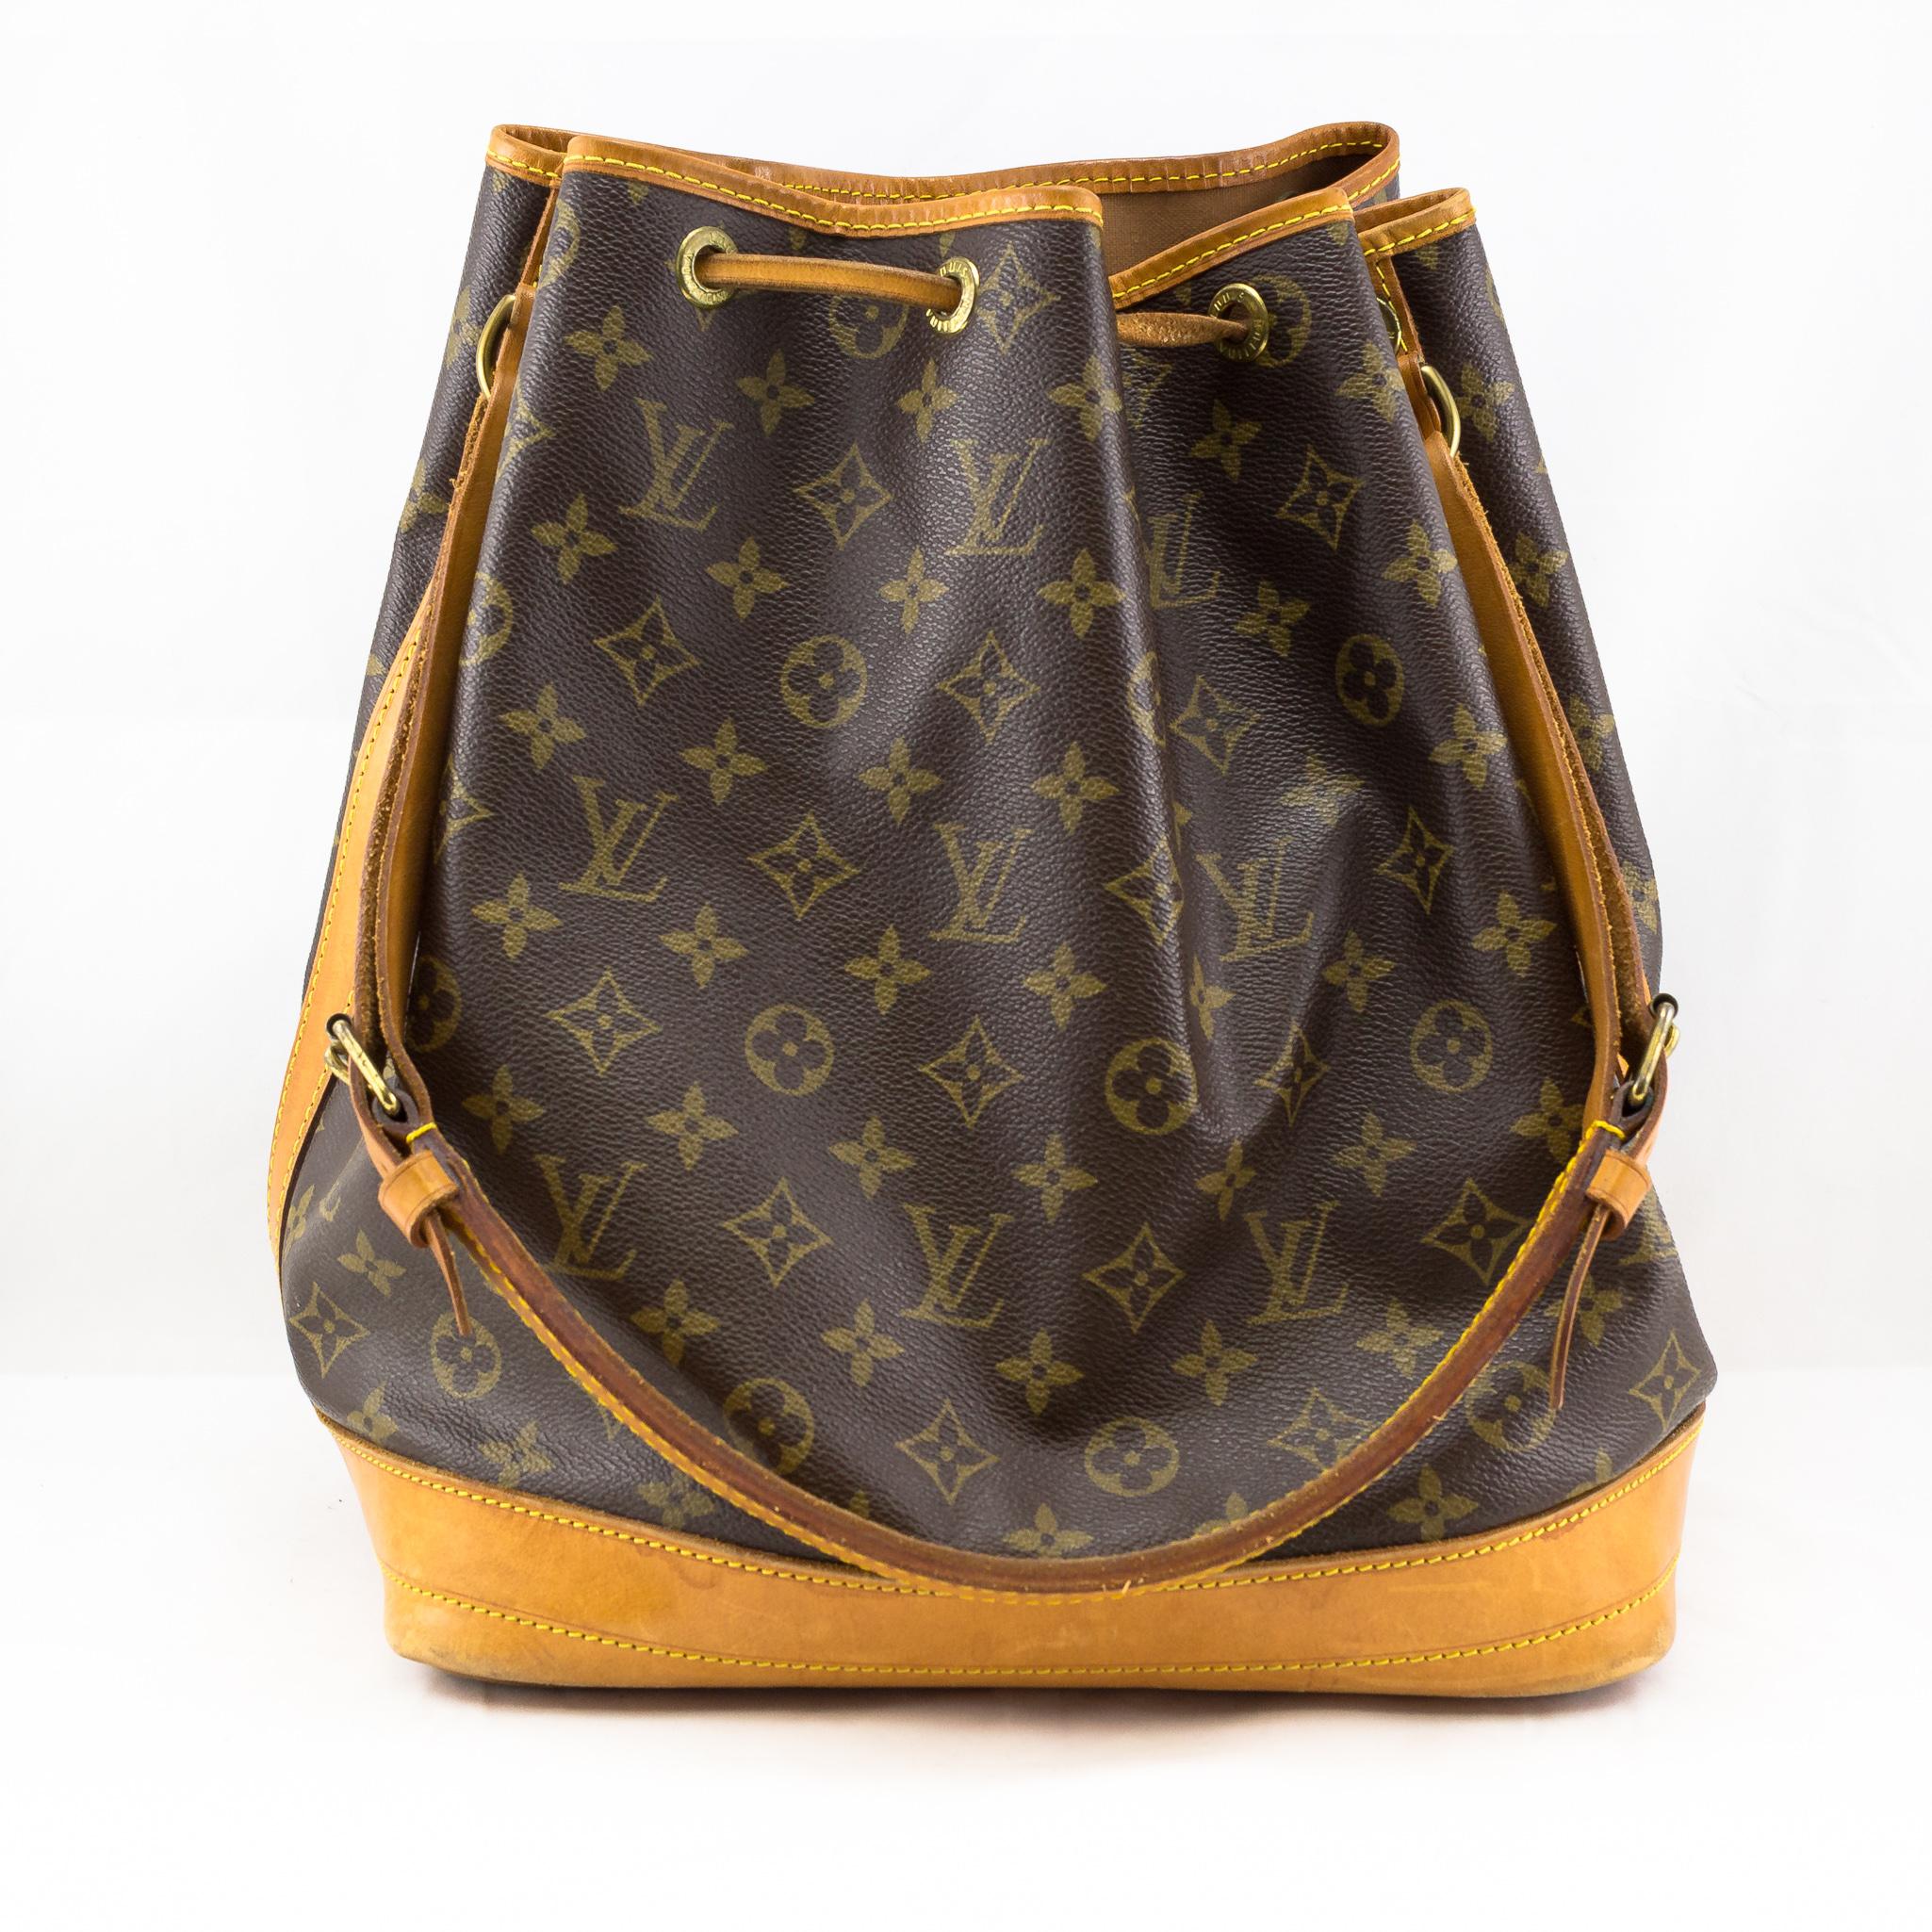 fd39344e67d8 LOUIS VUITTON Signature Monogram Draw String Shoulder Bag 100% Genuine